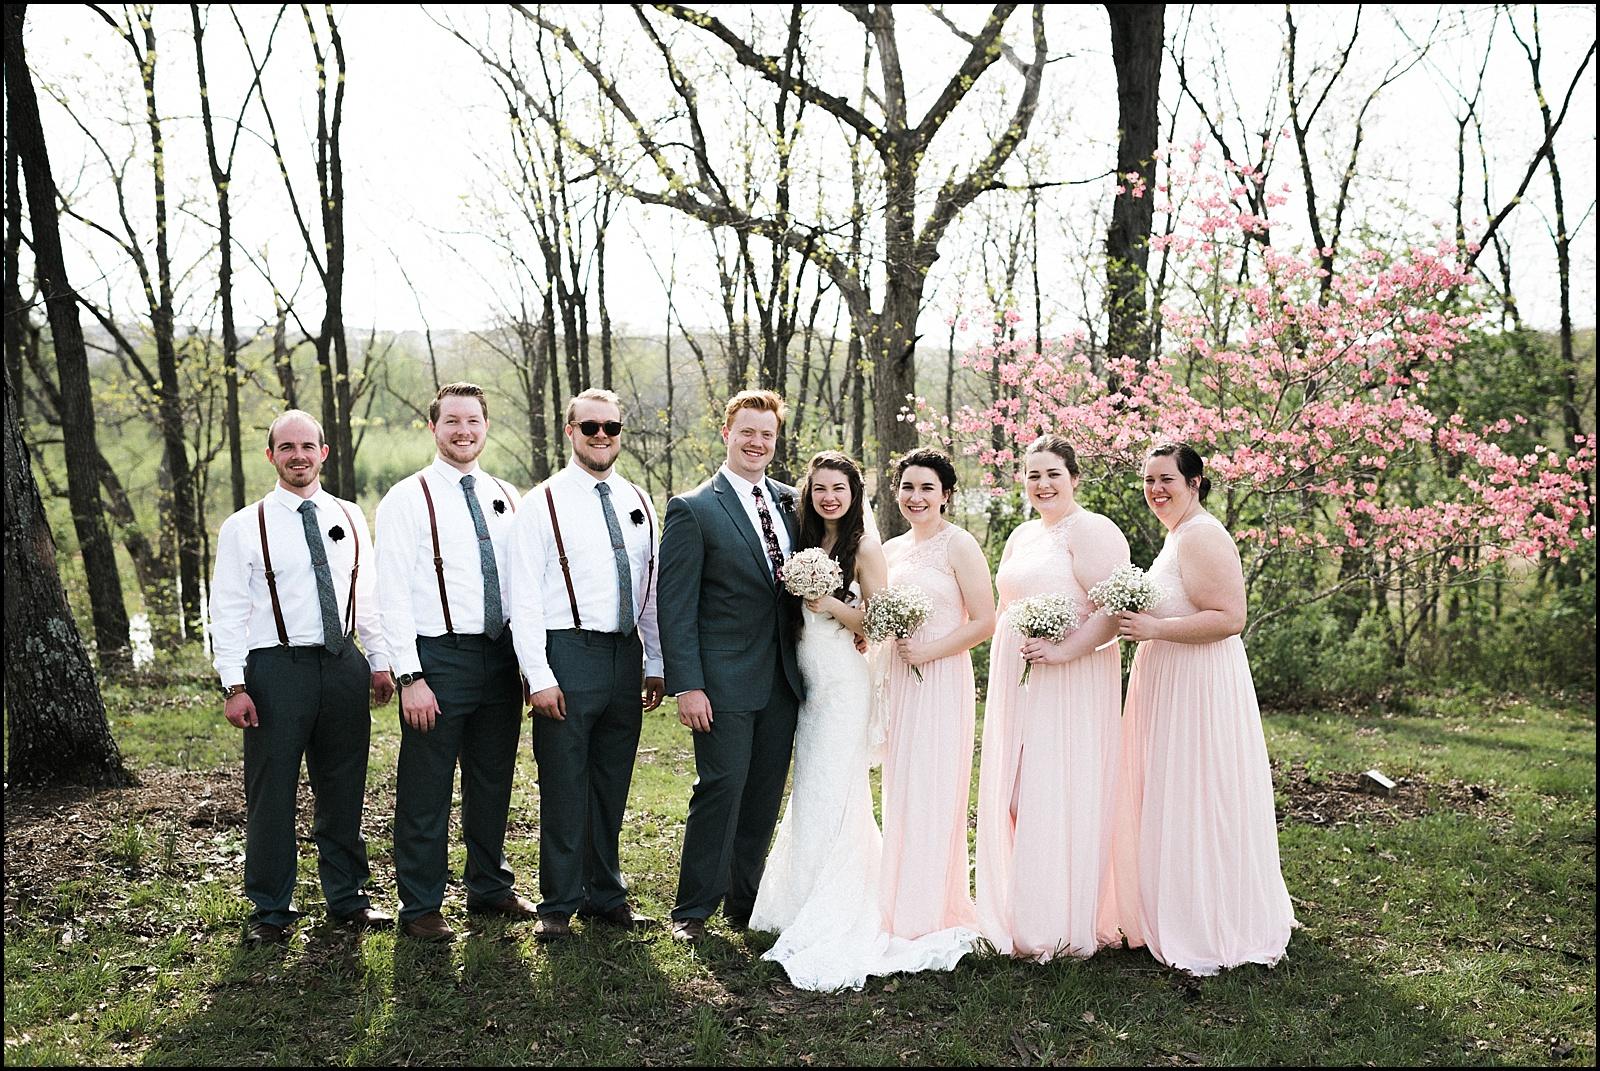 Full bridal party